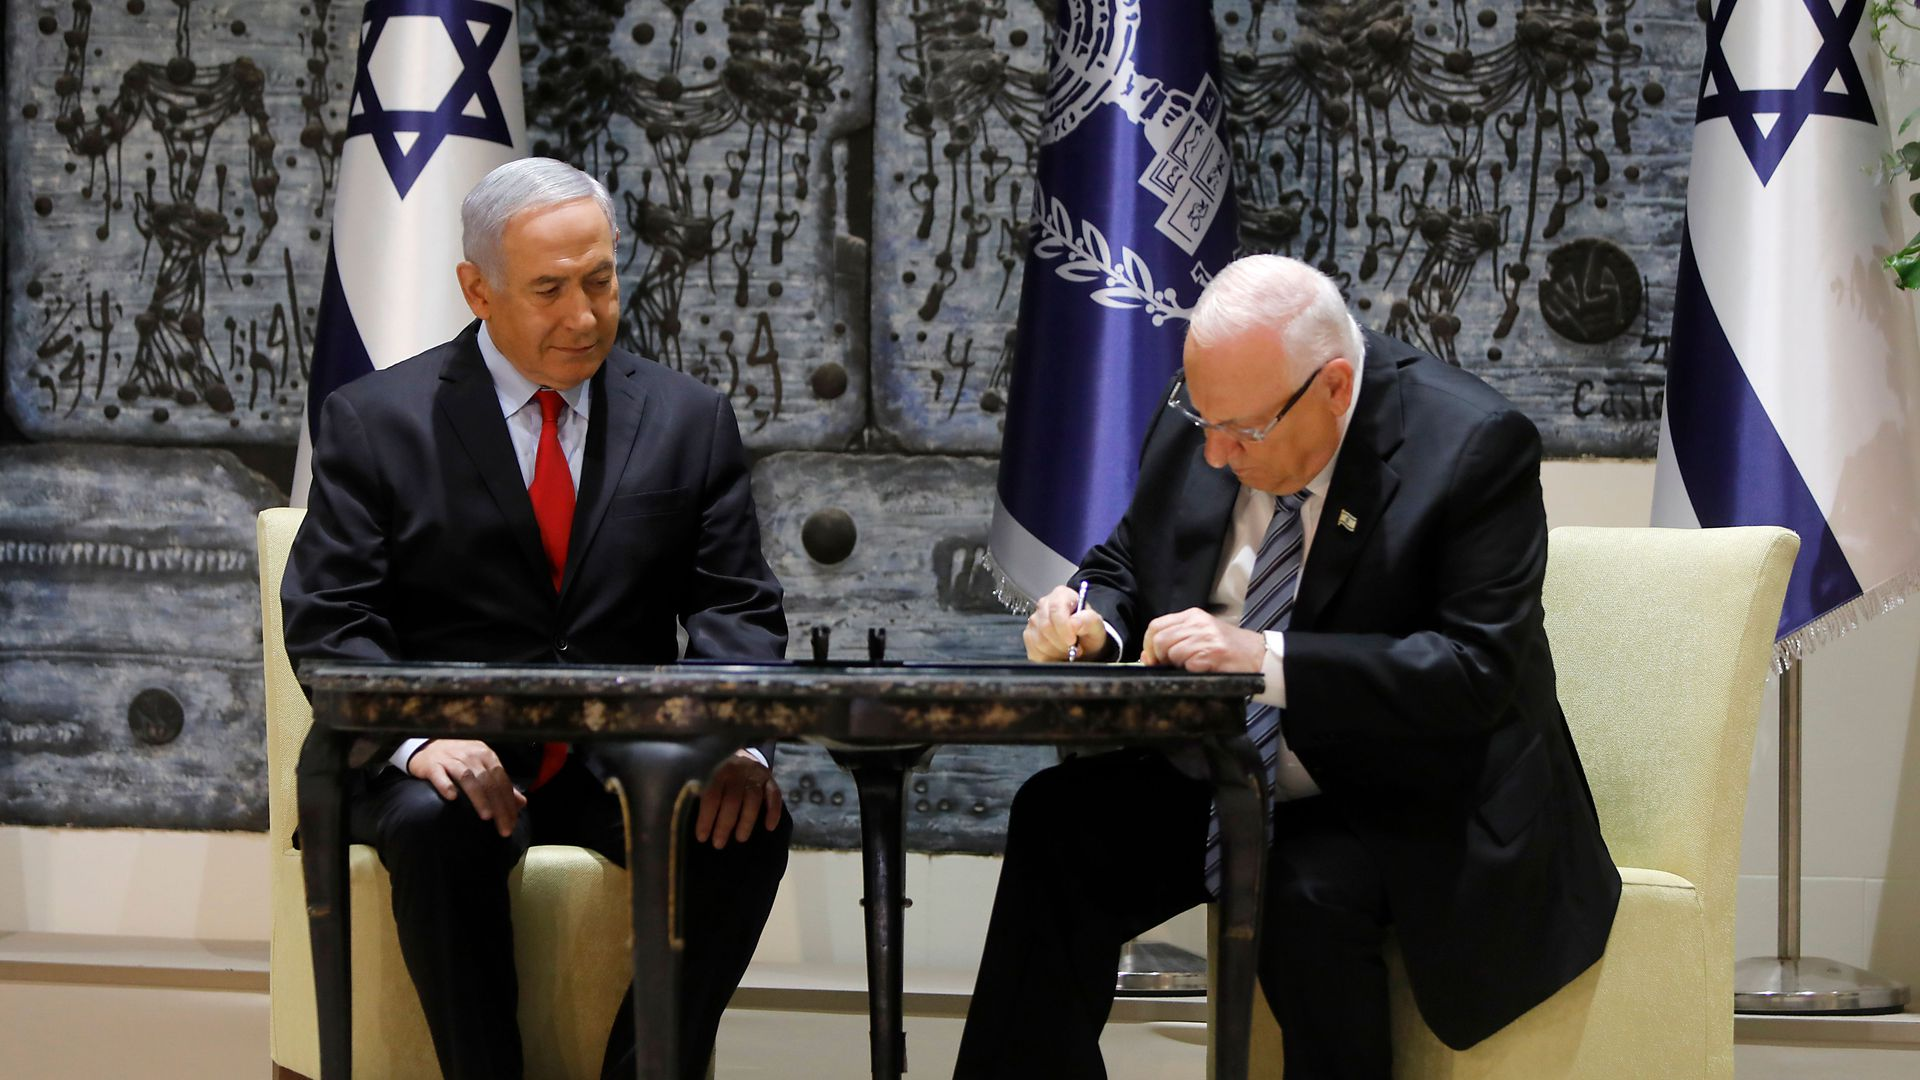 Netanyahu with Israel's president